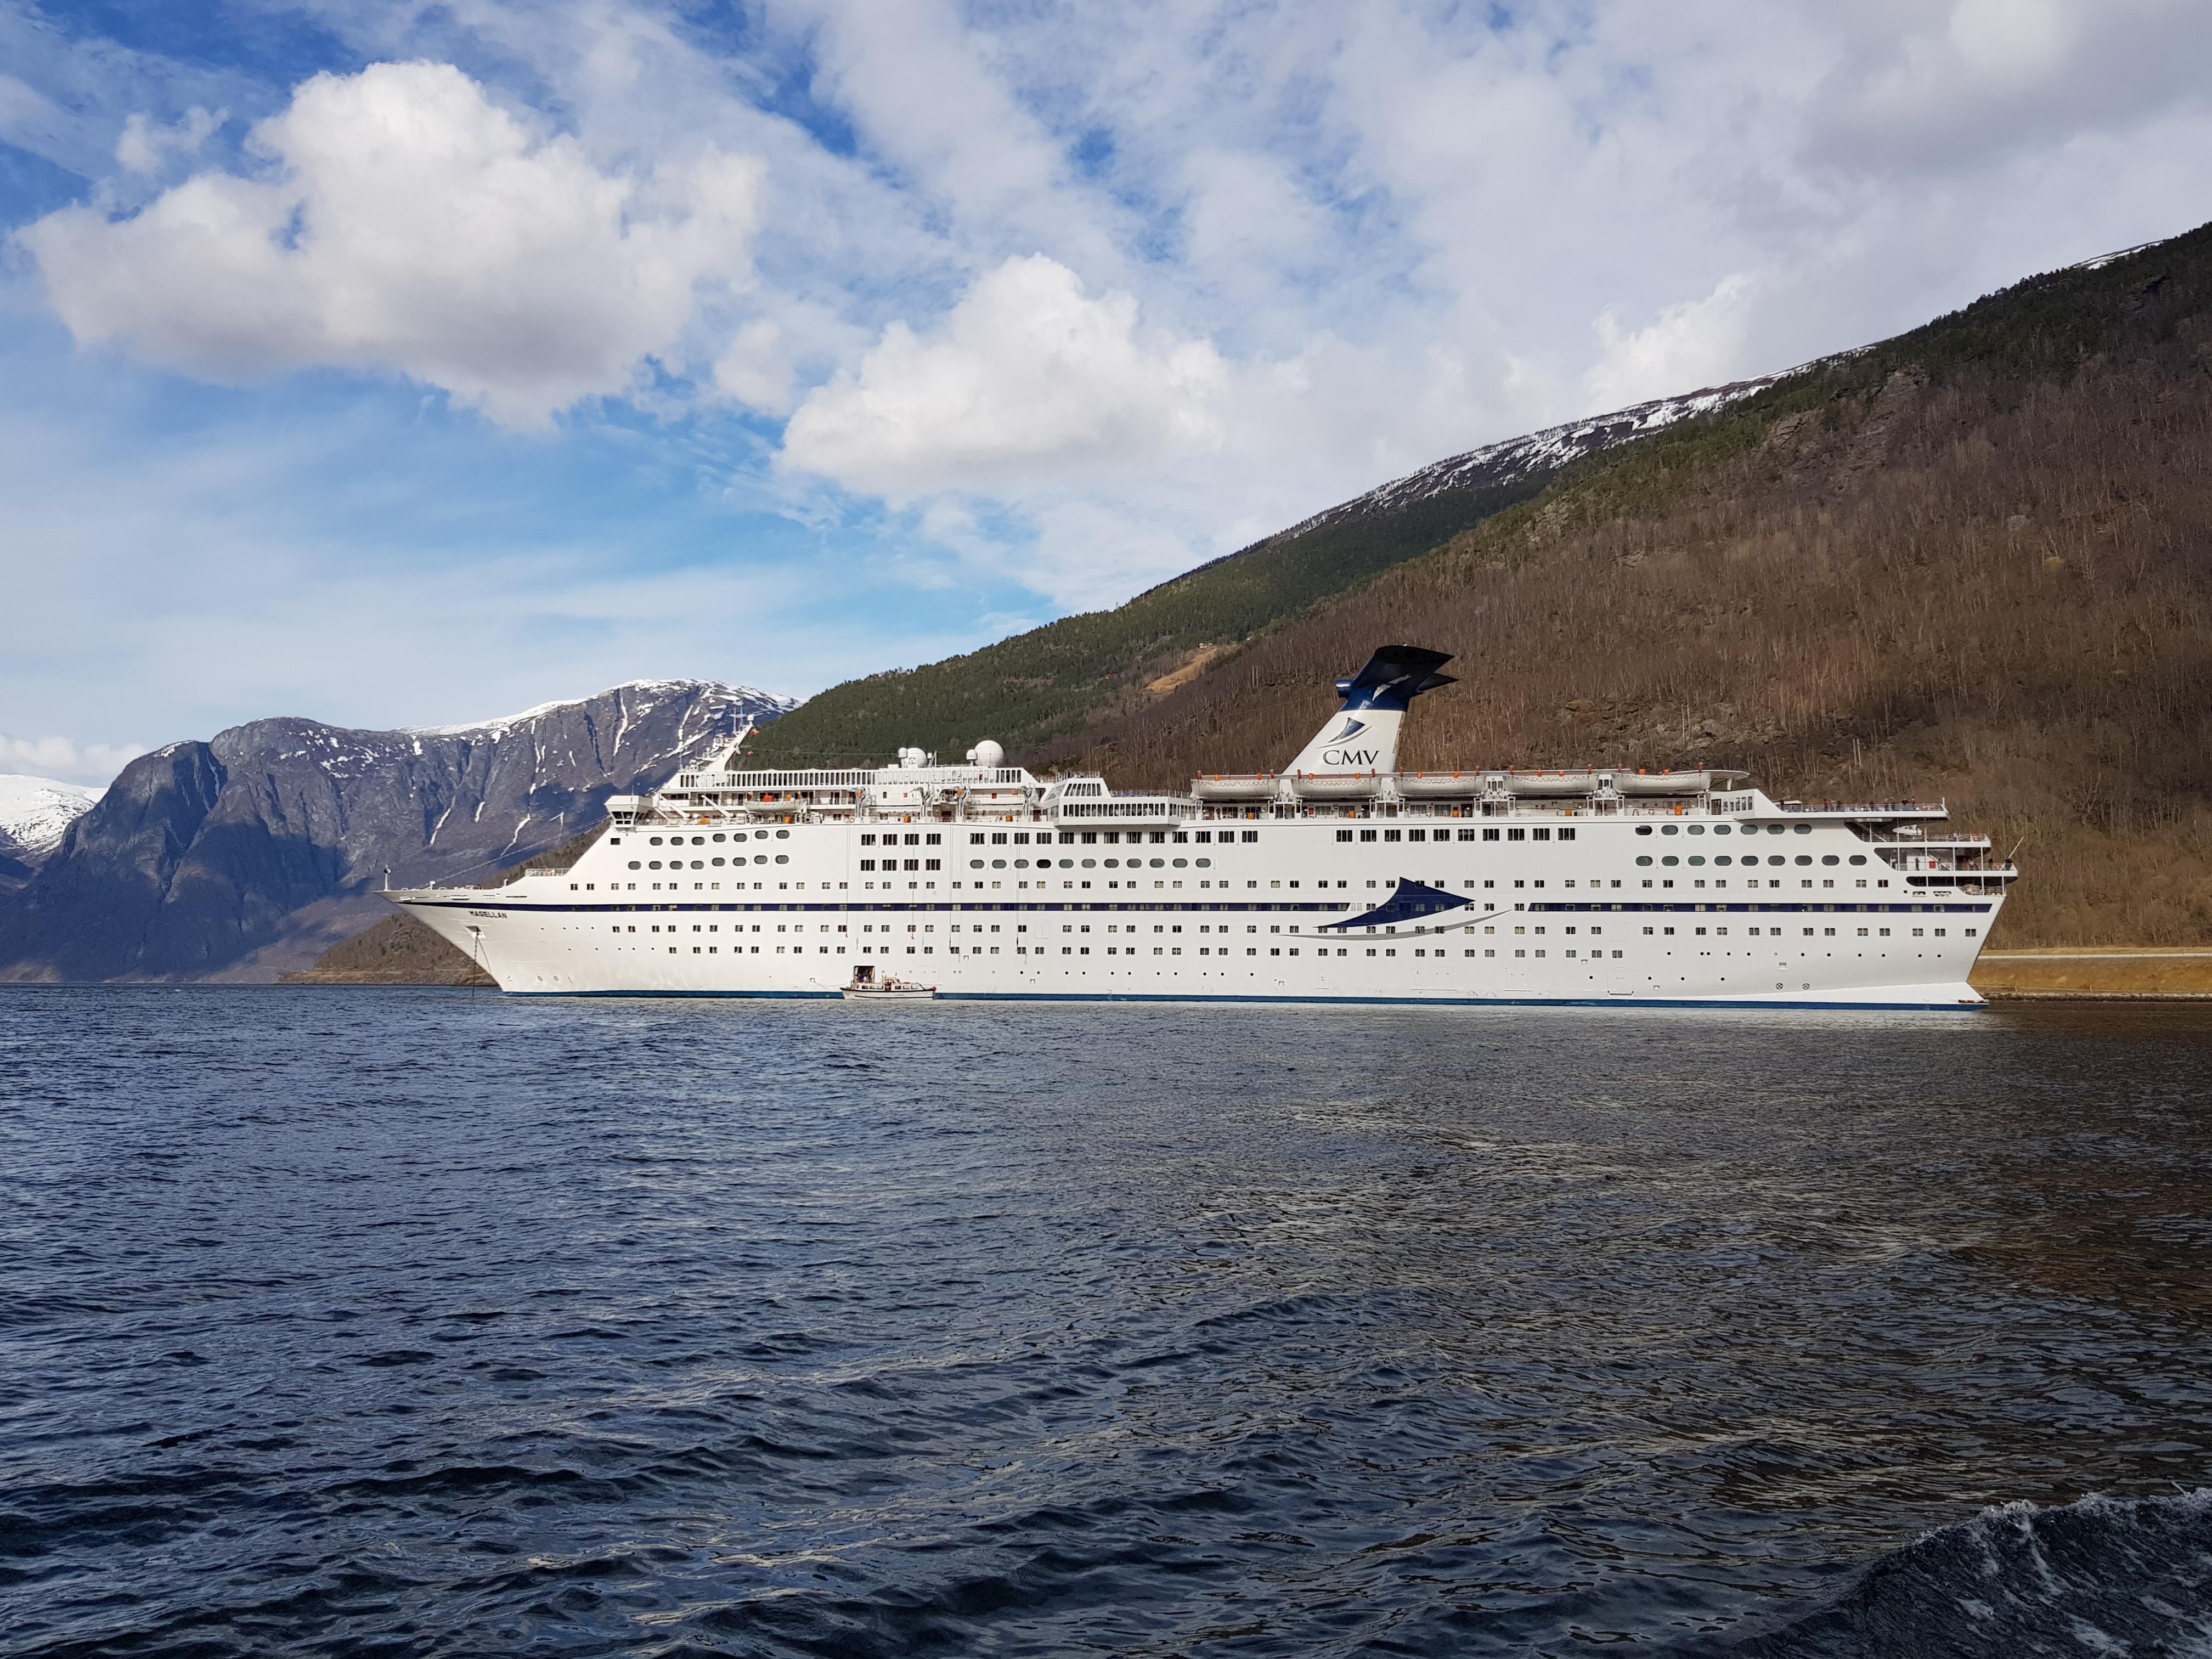 The P&J cruise will be on board the majestic Magellan.